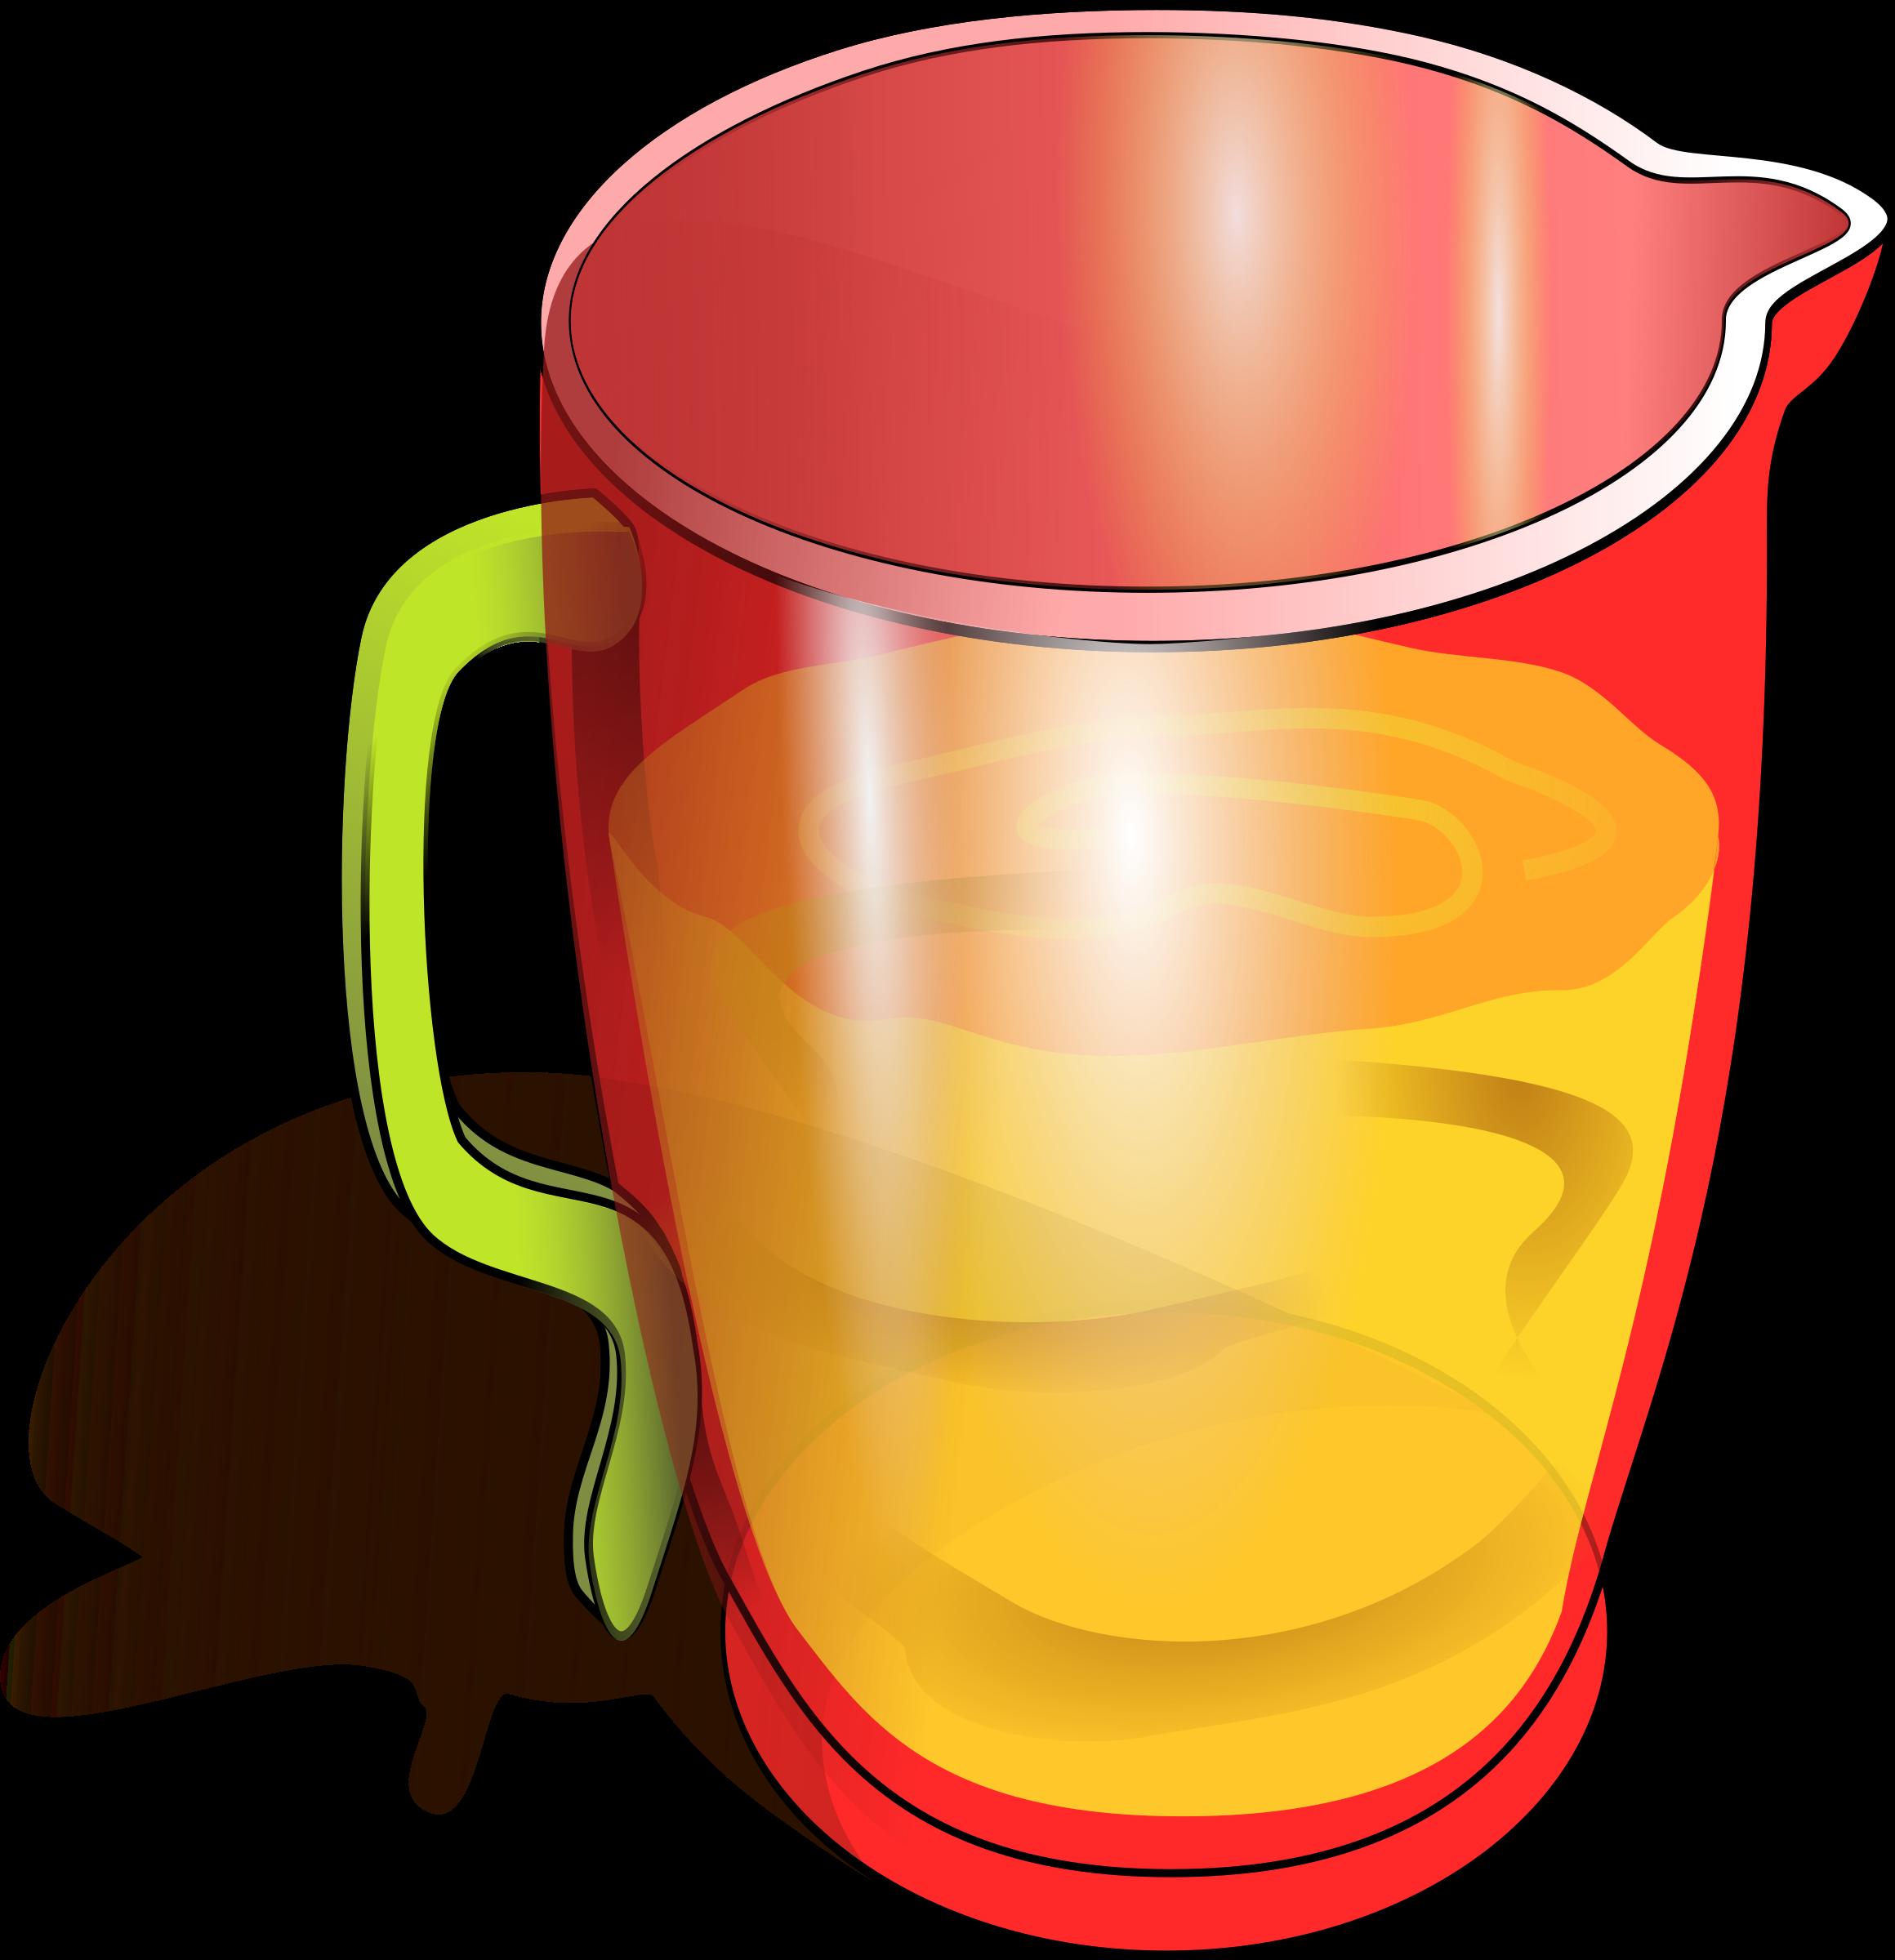 clipart stock Big image png. Mug clipart jug.